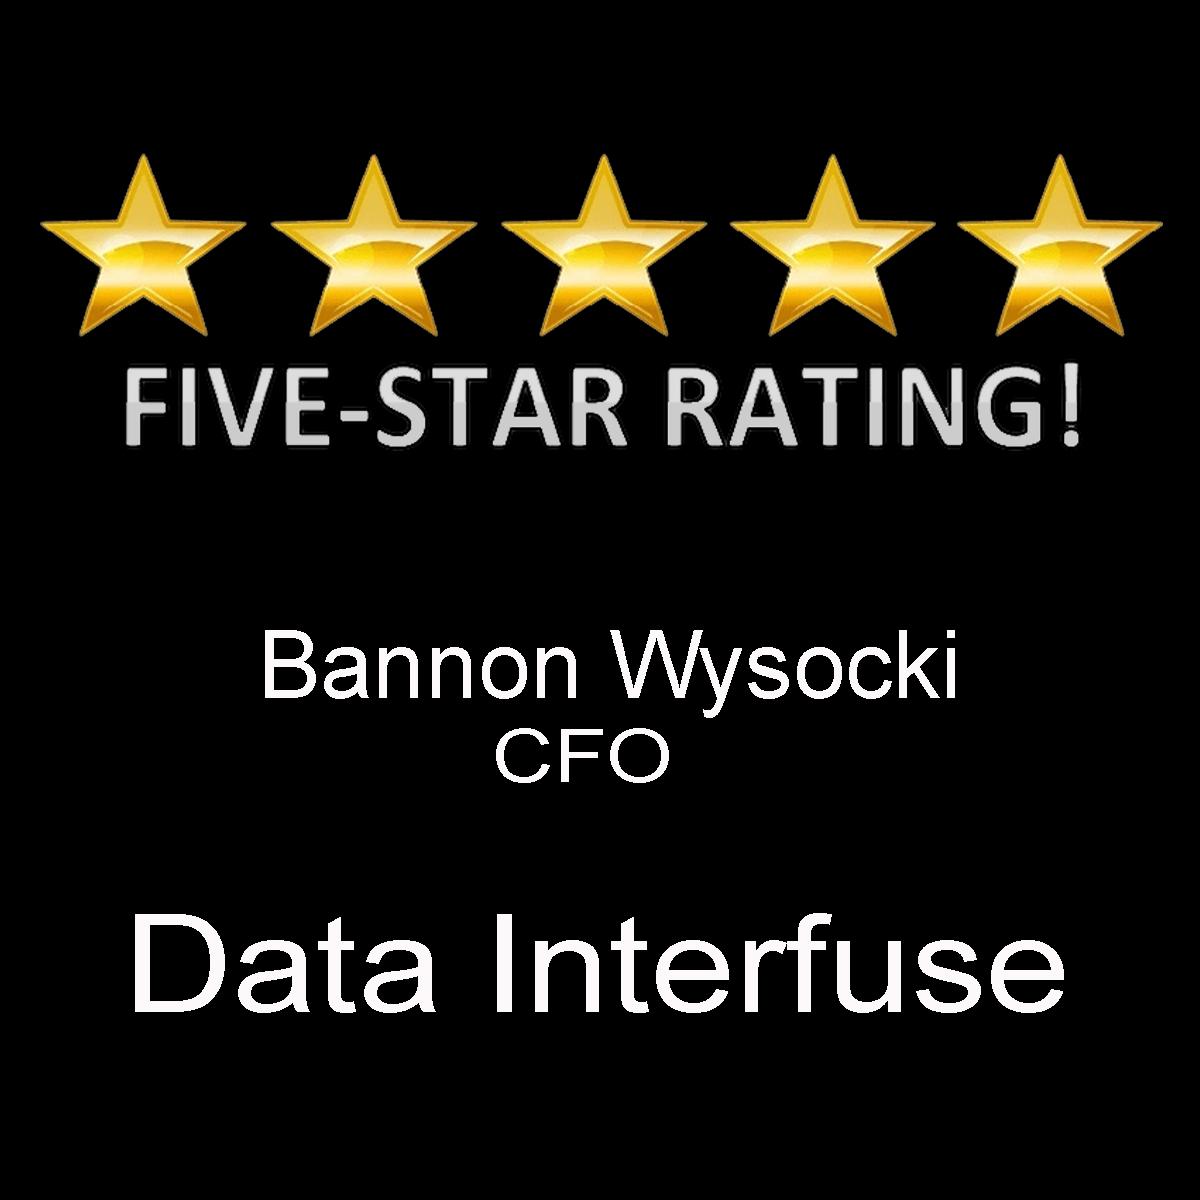 5 star data interfuse